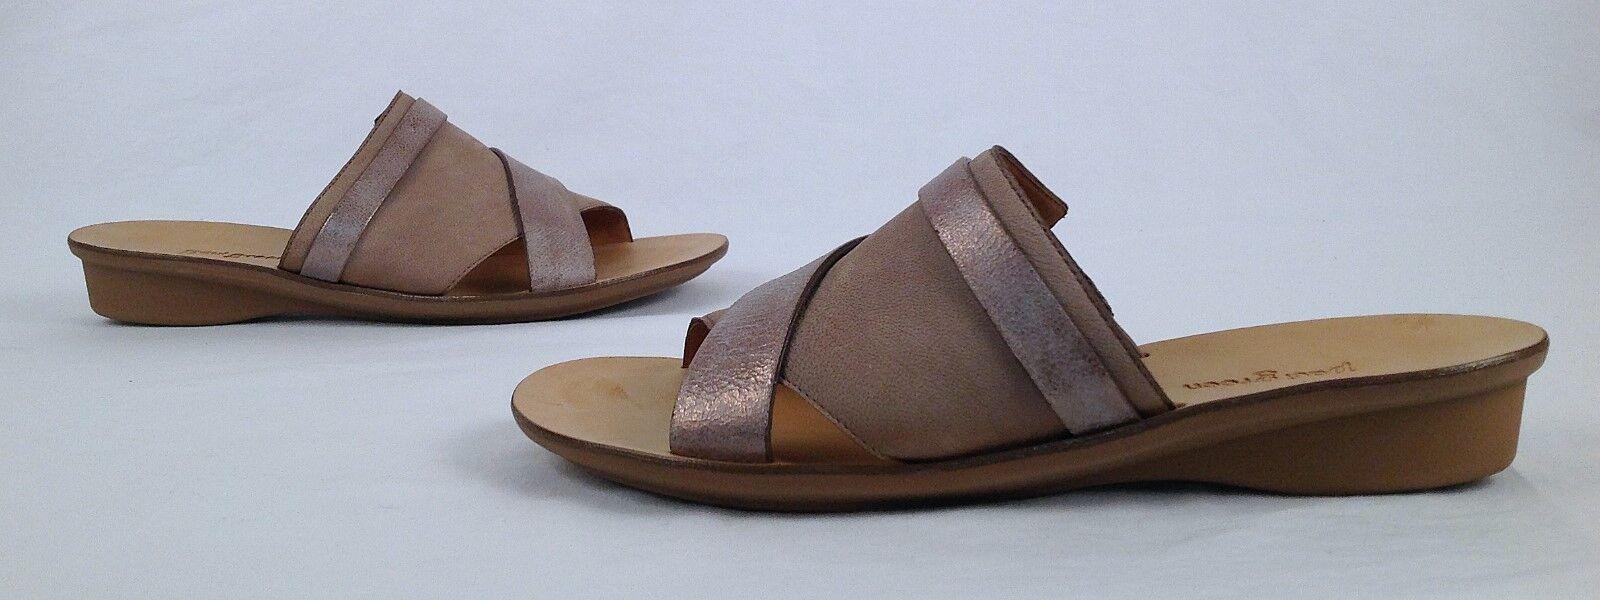 Paul Green-'Bayside' Pelle Sandal 235  -Taglia US 10/ EU 7.5-  235 Sandal  (P16) 898573